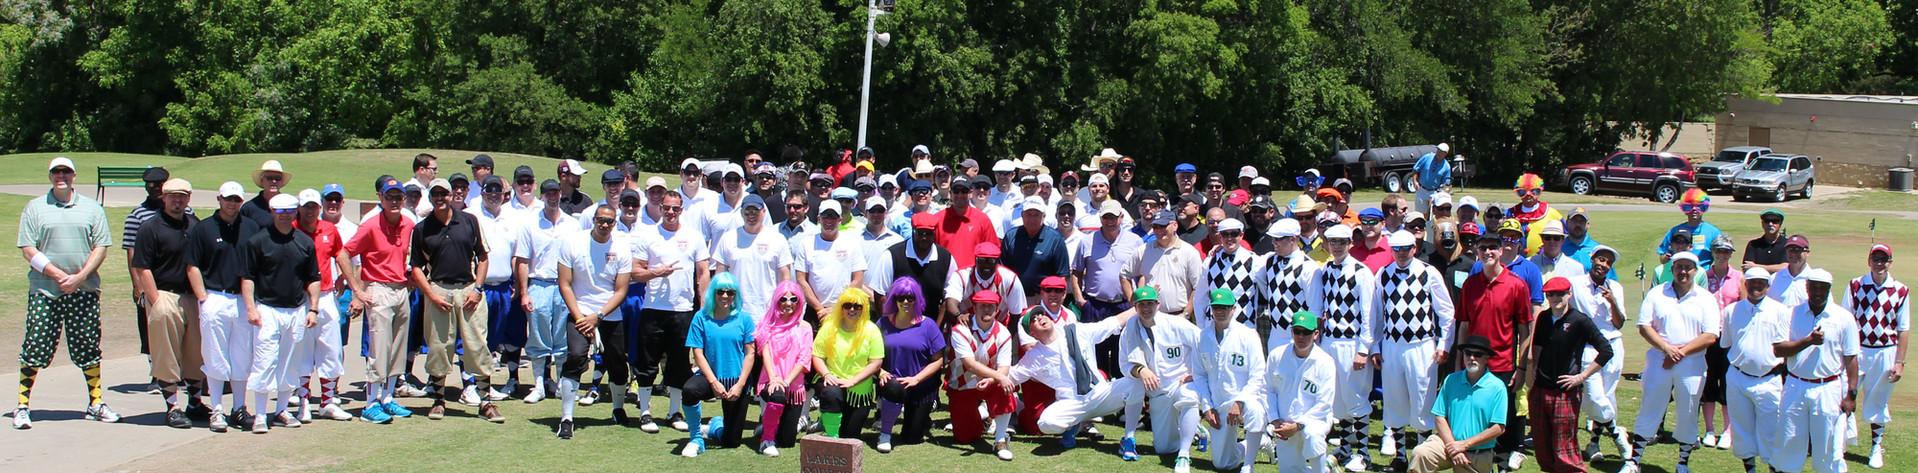 2014 Group Pic.jpg